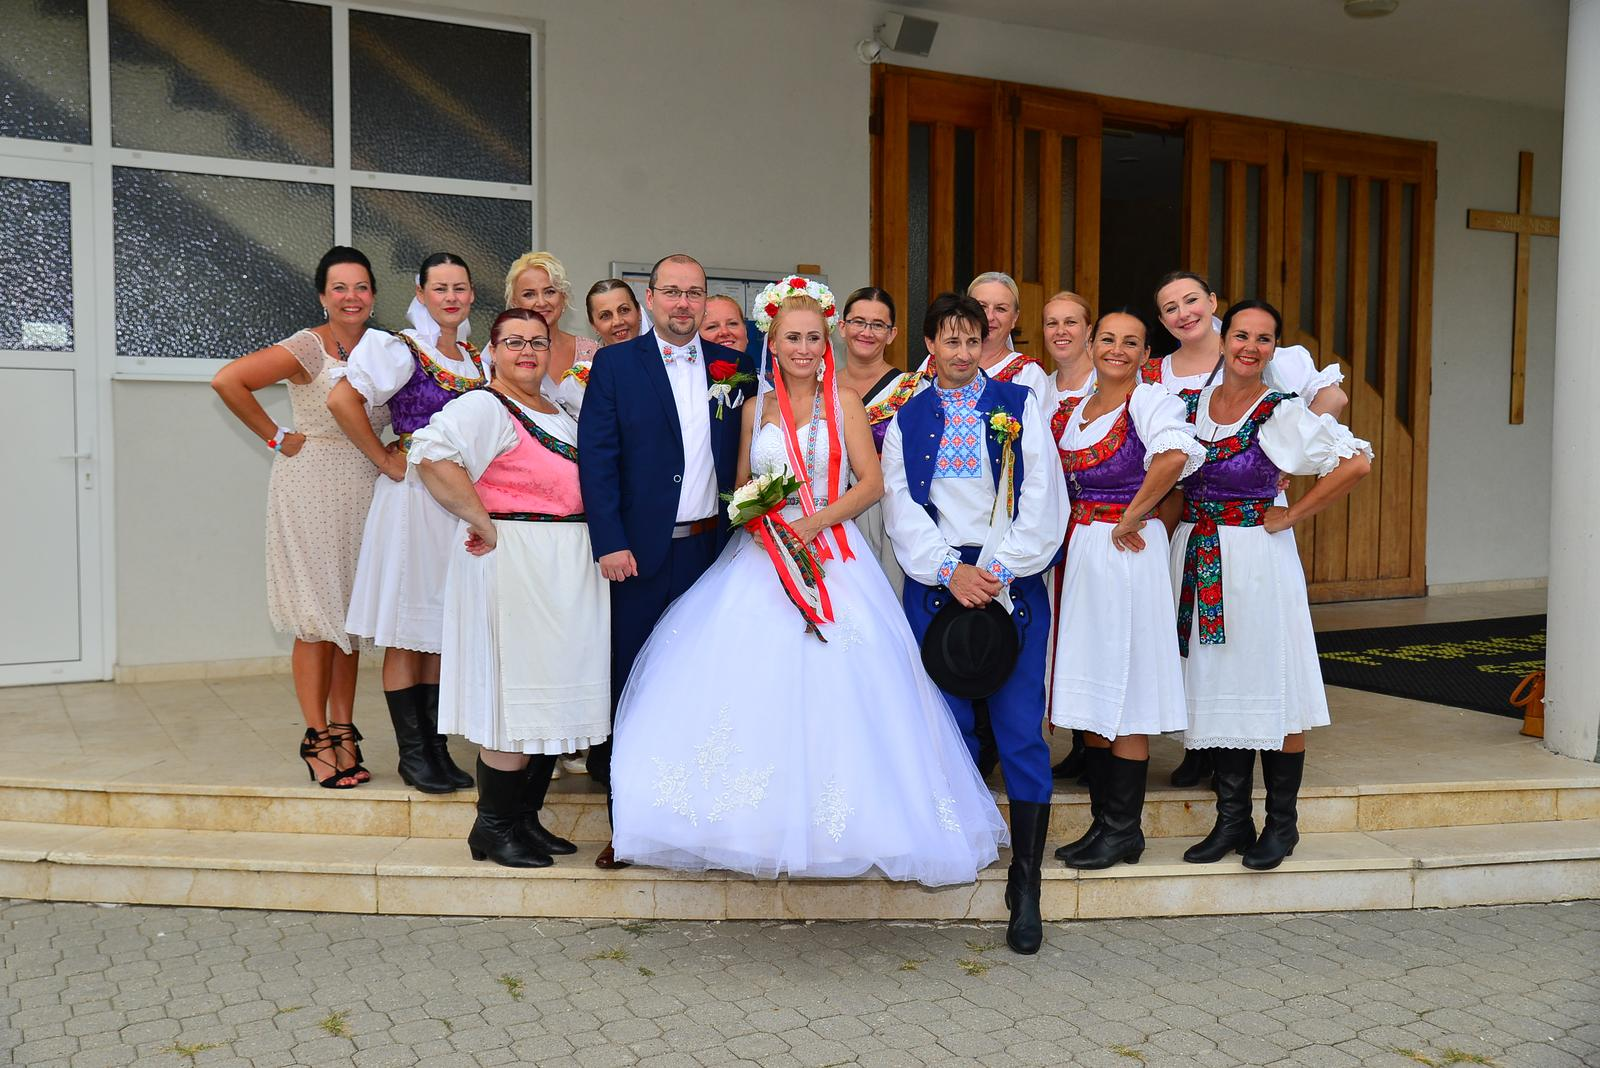 Folklorna svadba M+M, 24.8.2019 Turany - Folklorna svadba M+M, 24.8.2019 Turany, autor Foto: Multimediálny DJ Maroš Chvojka 015